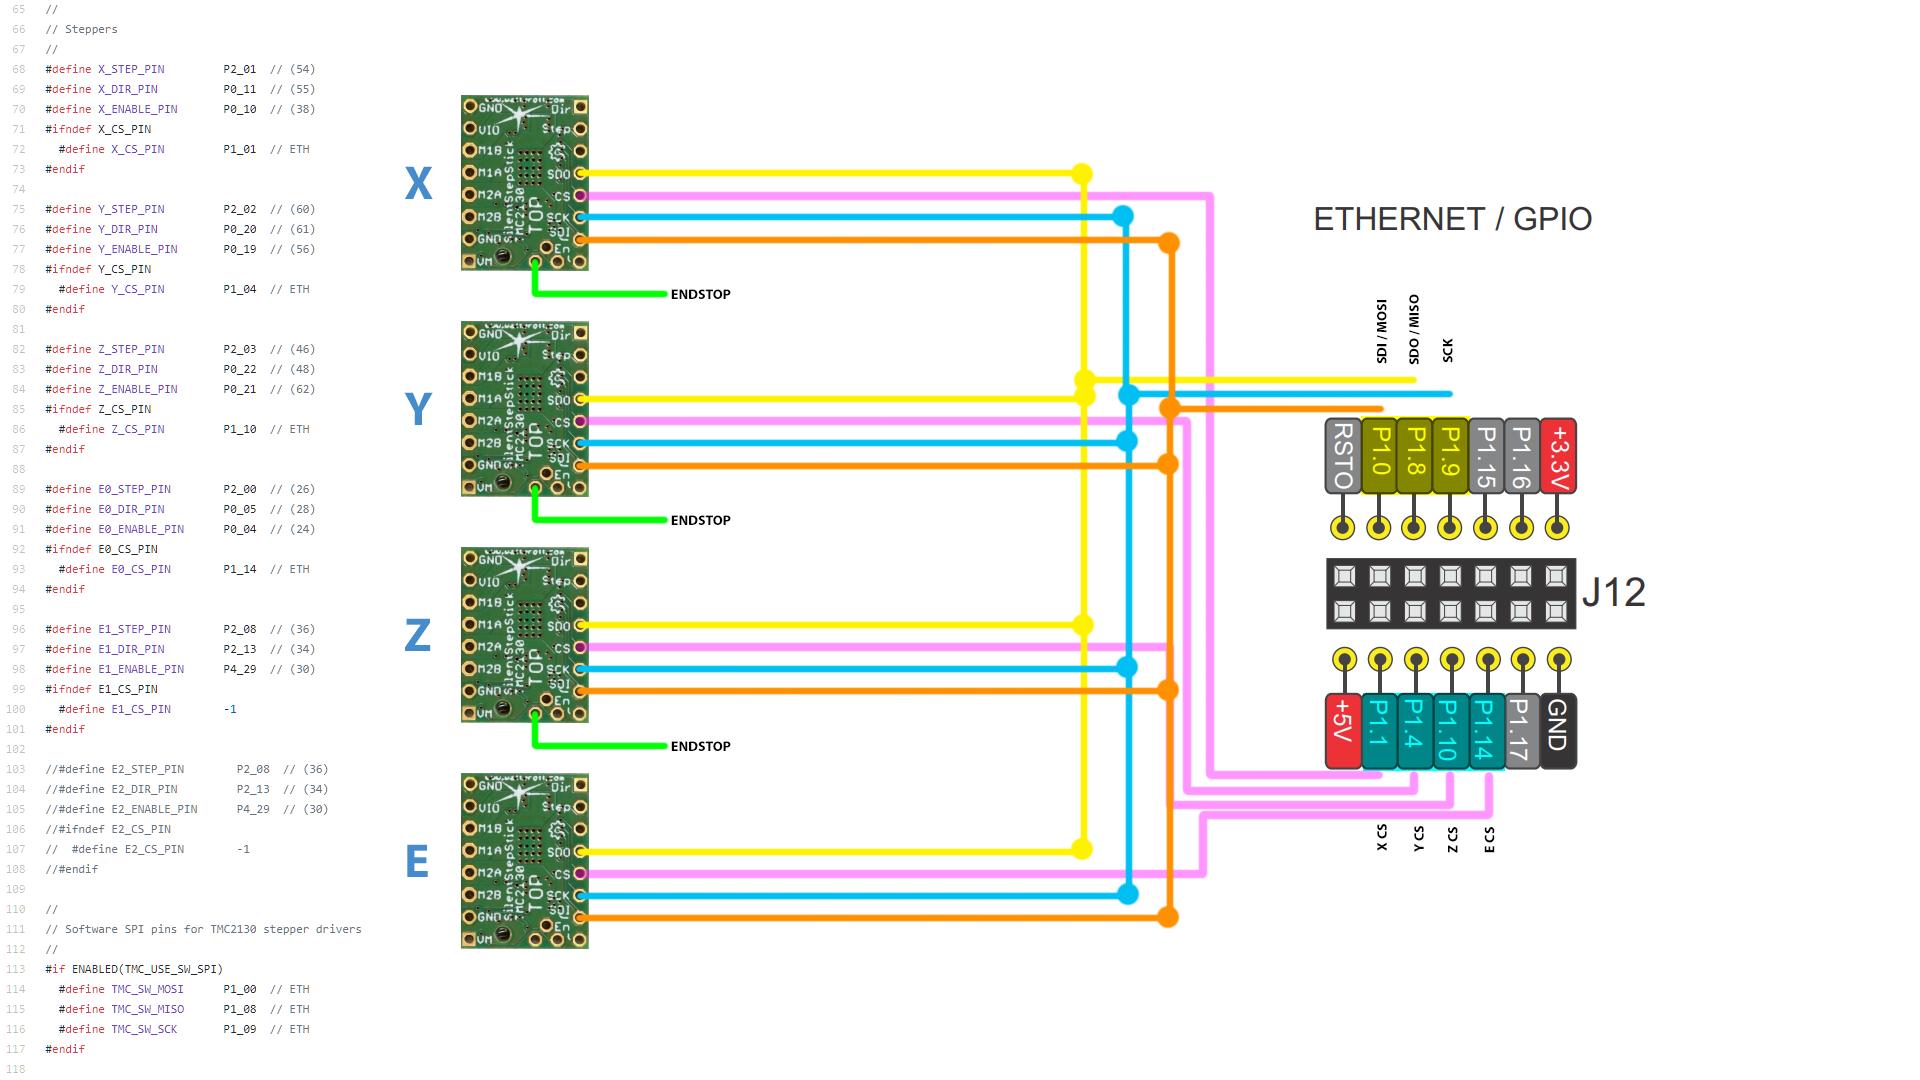 Bugfix 2 0 x] TMC2130 Re-ARM Software SPI · Issue #9452